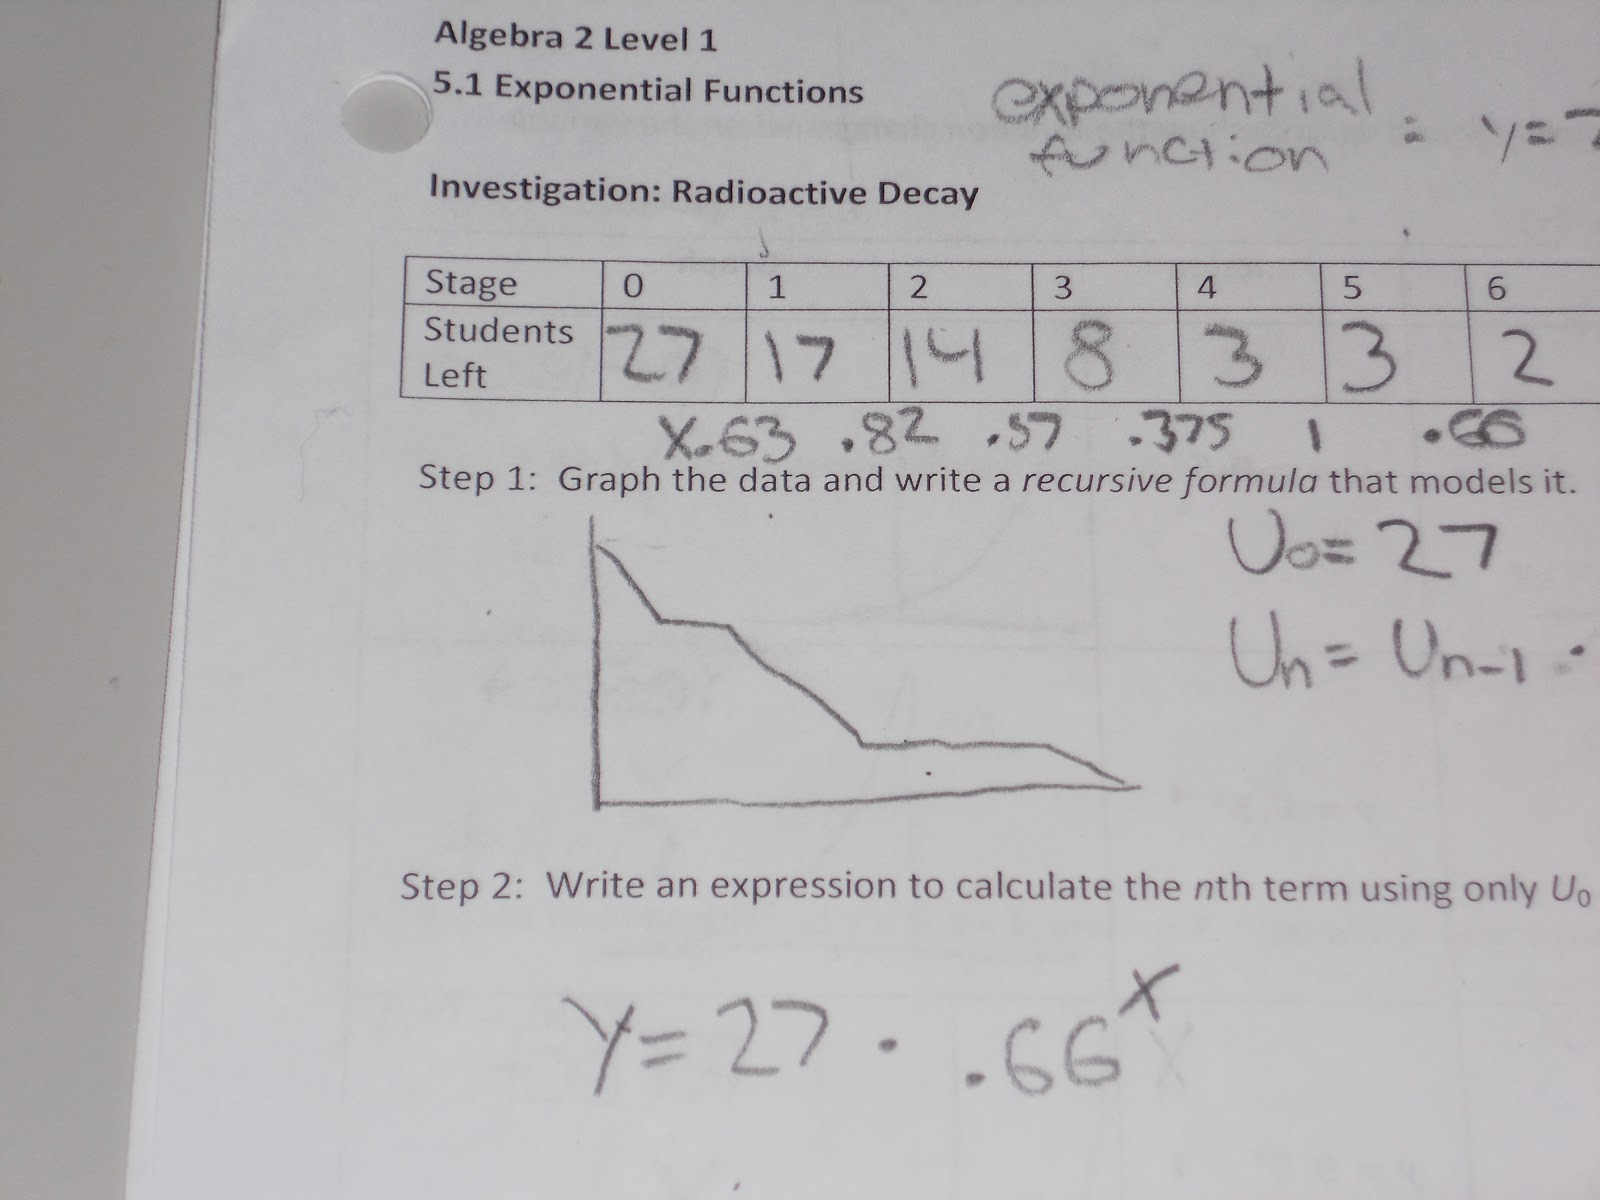 Pogact S White 1 Algebra 2 Level 1 Blog 5 1 Exponential